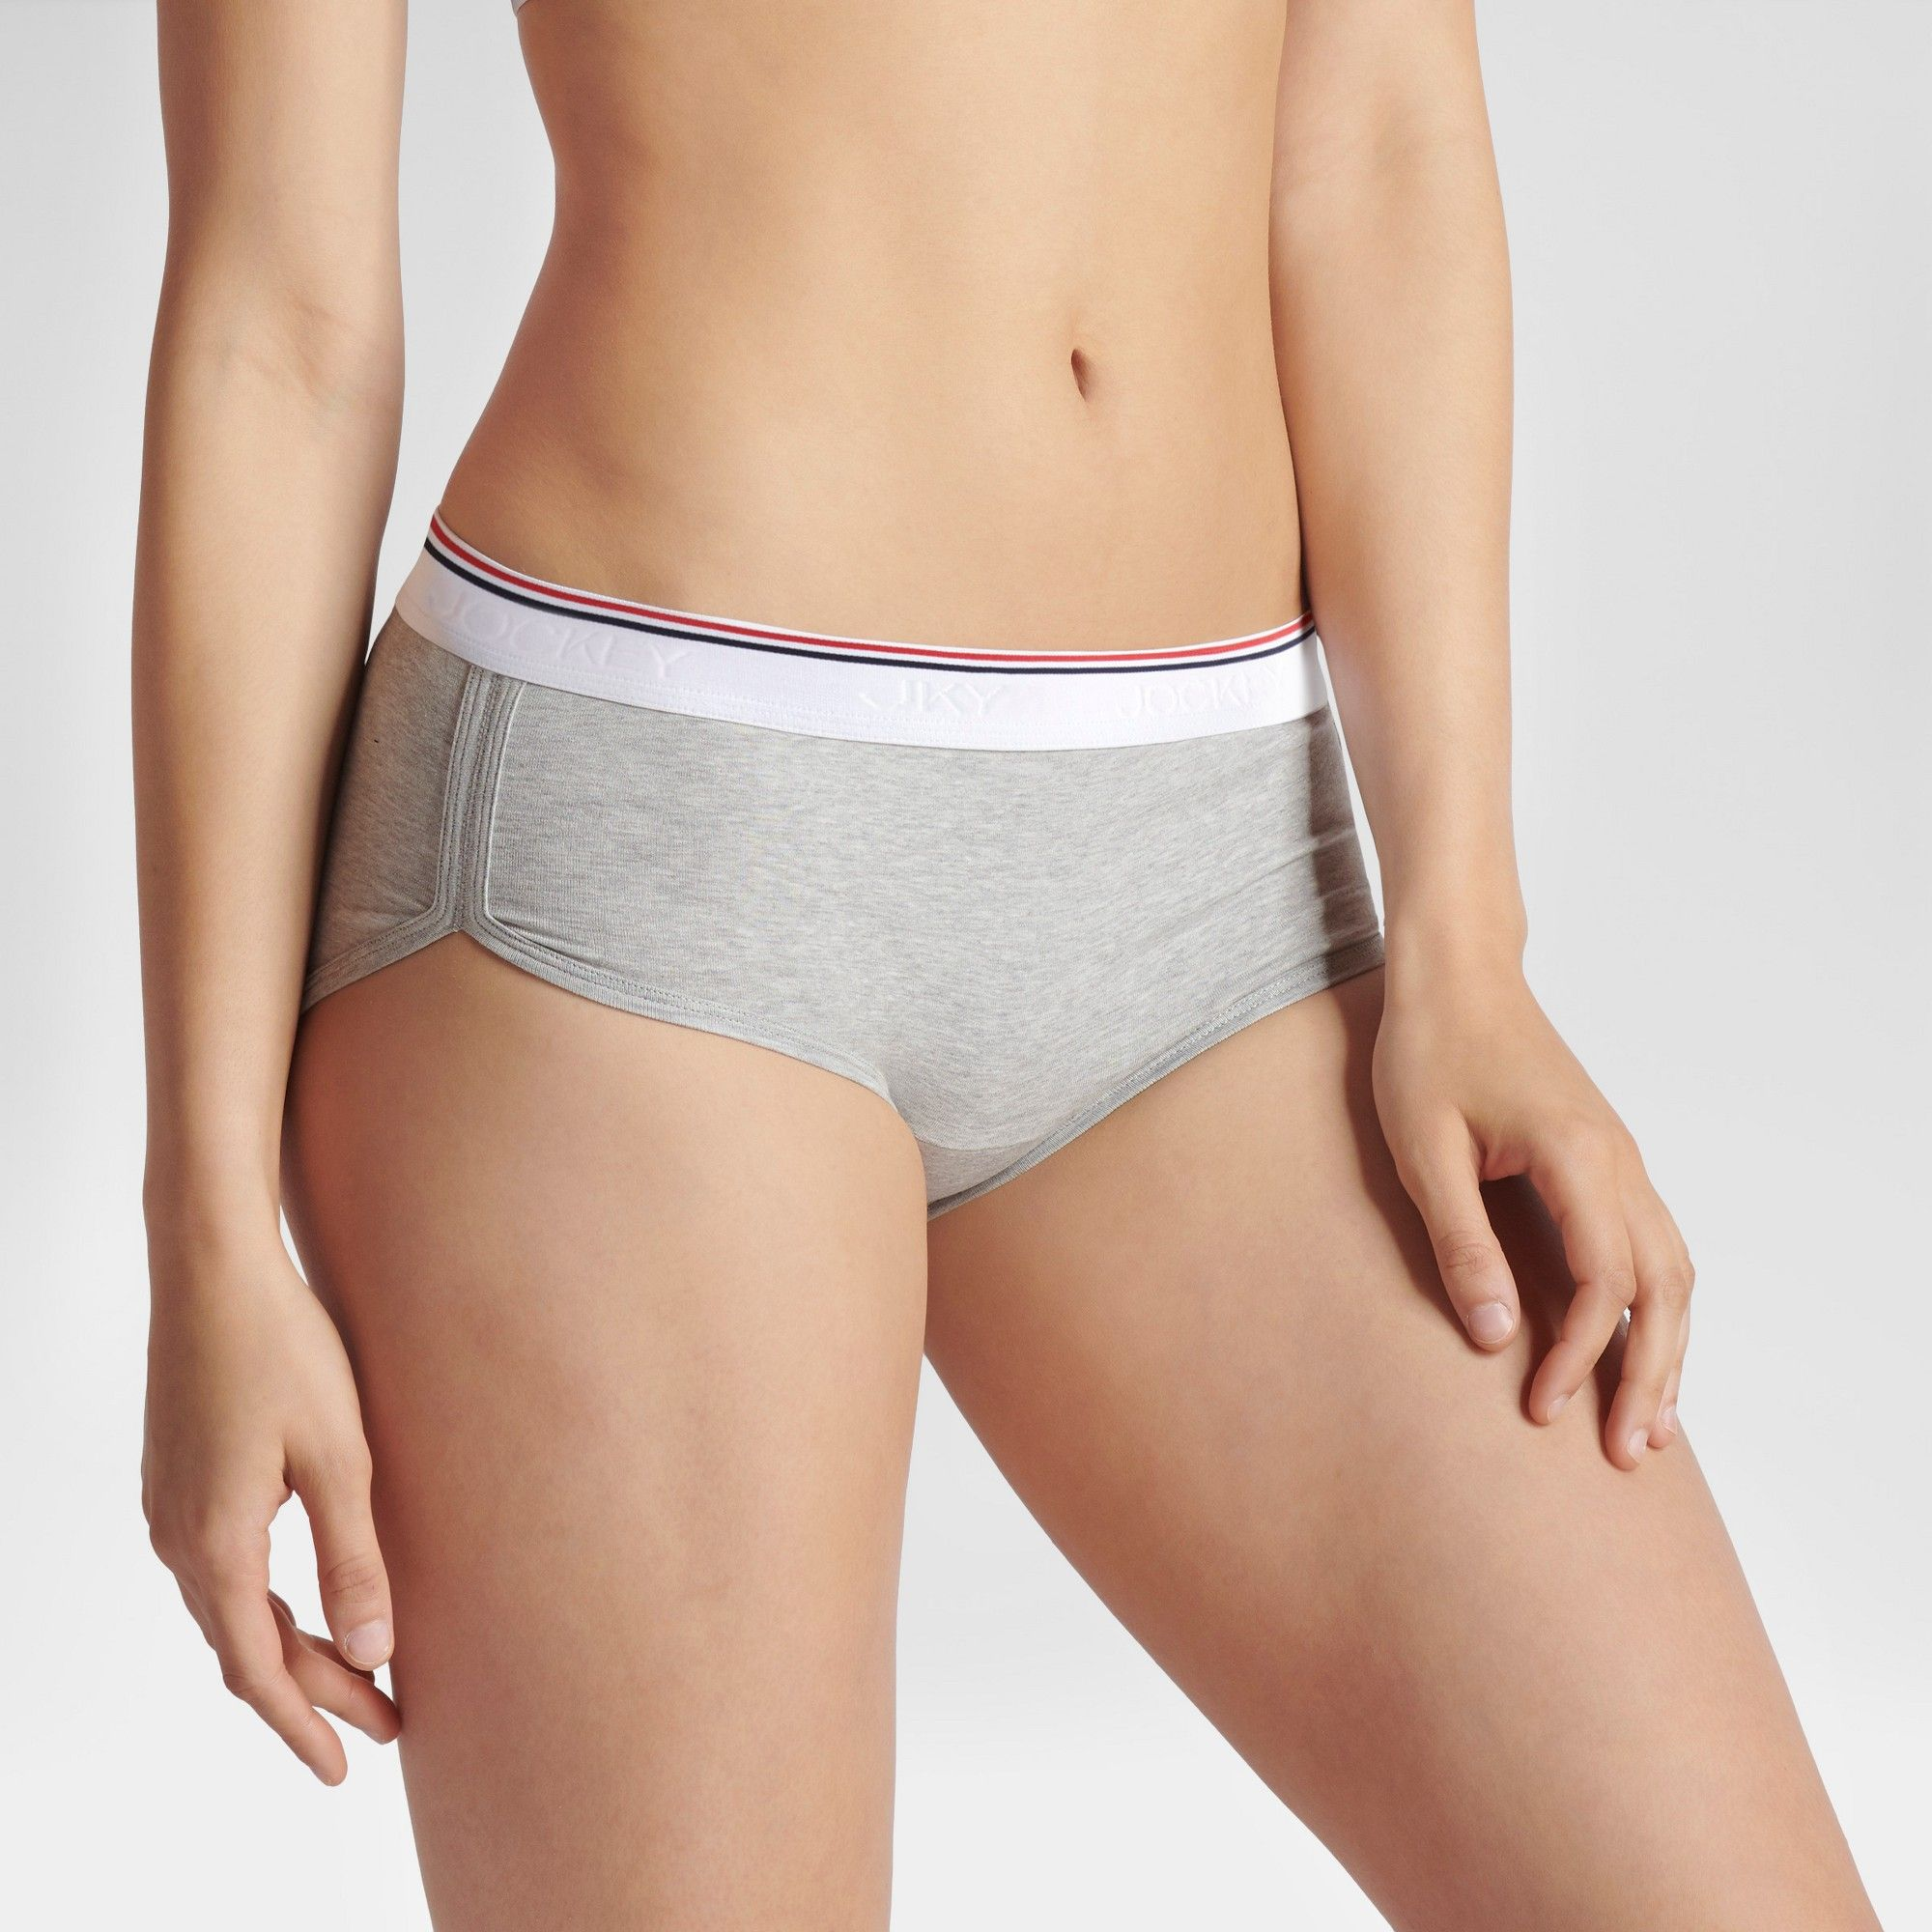 ff84c628301b JKY by Jockey Women's Striped Retro Vibes Girl Shorts - Gray XL ...